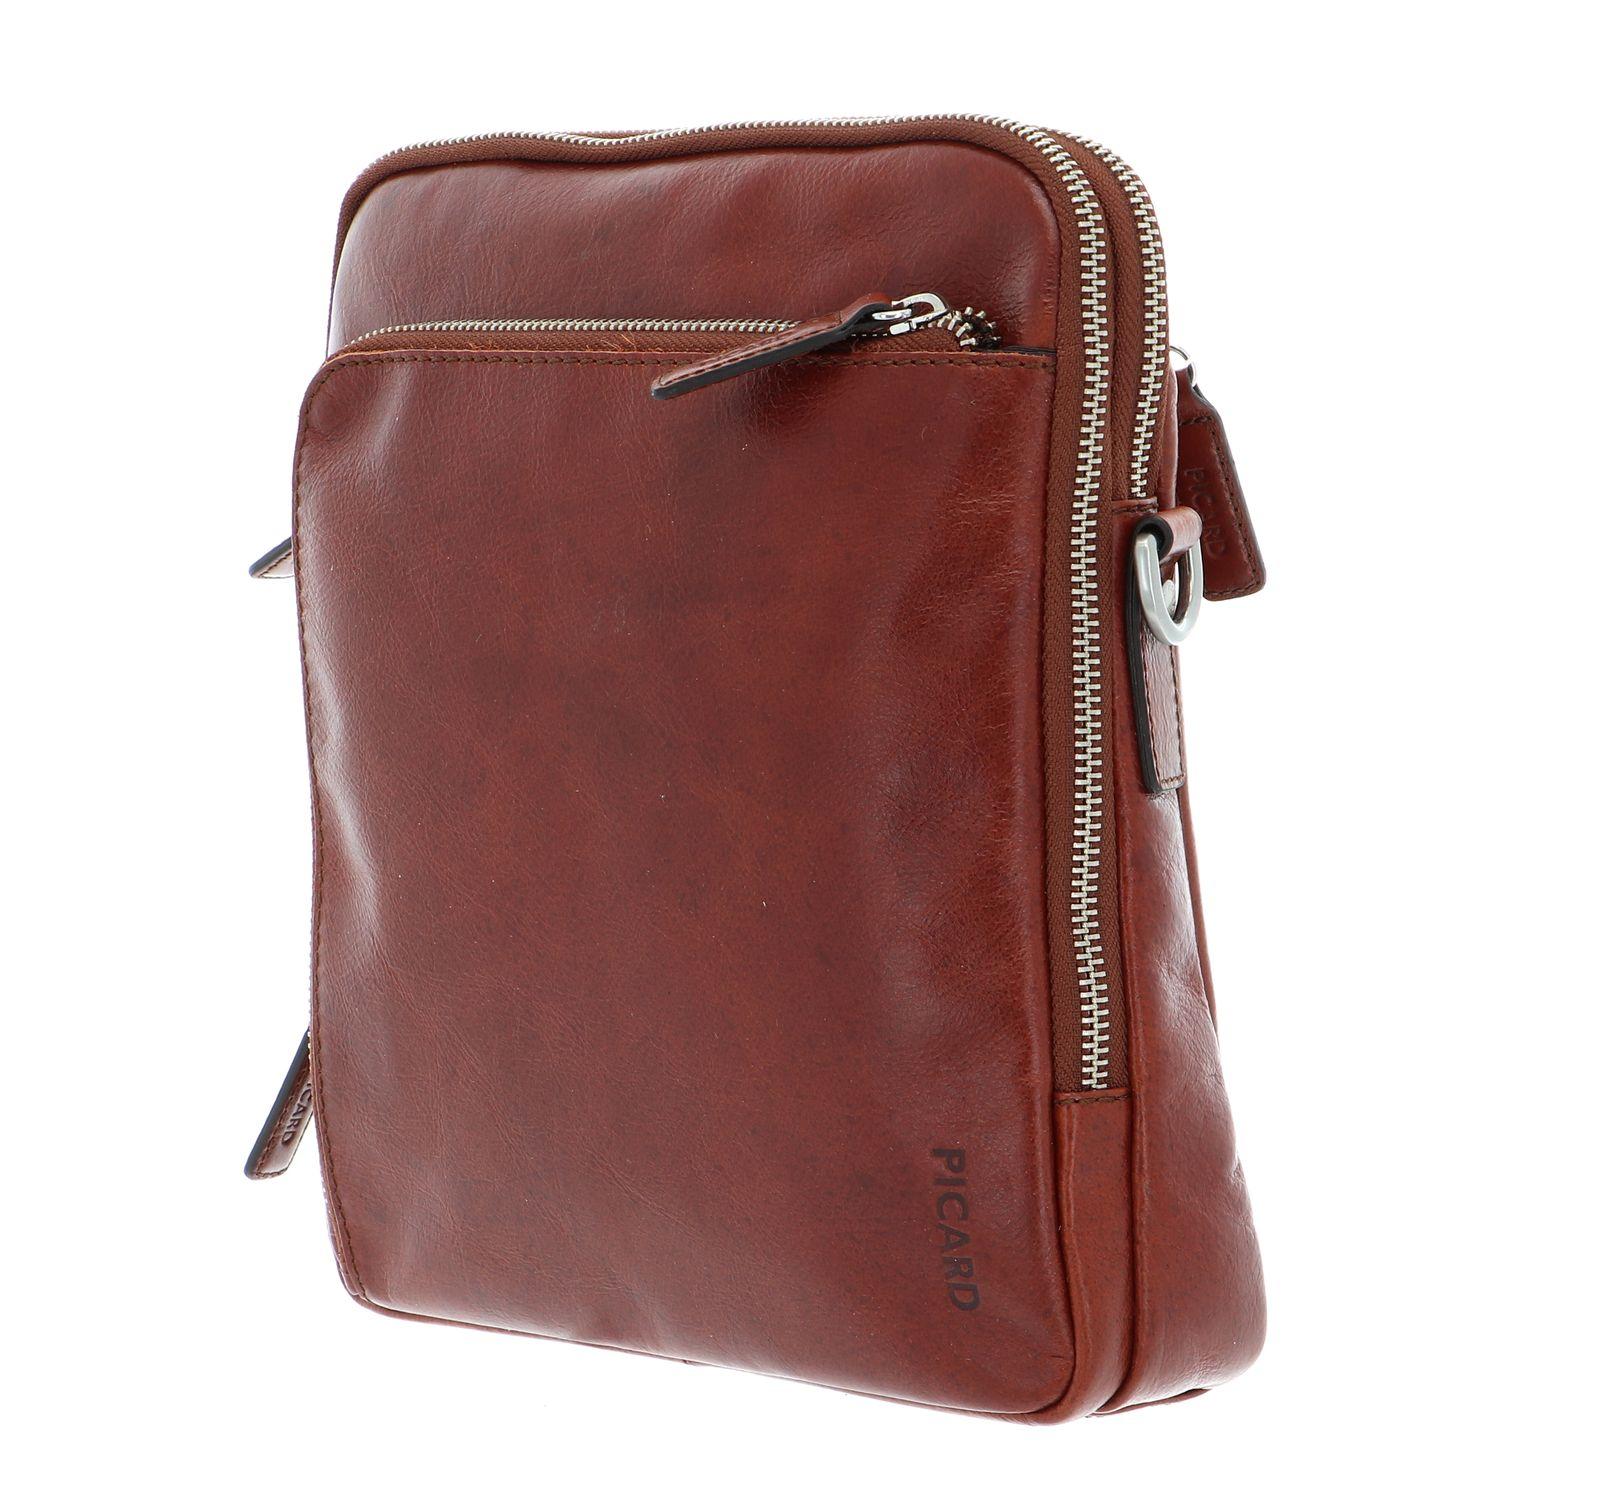 PICARD Buddy Messenger Bag Cognac